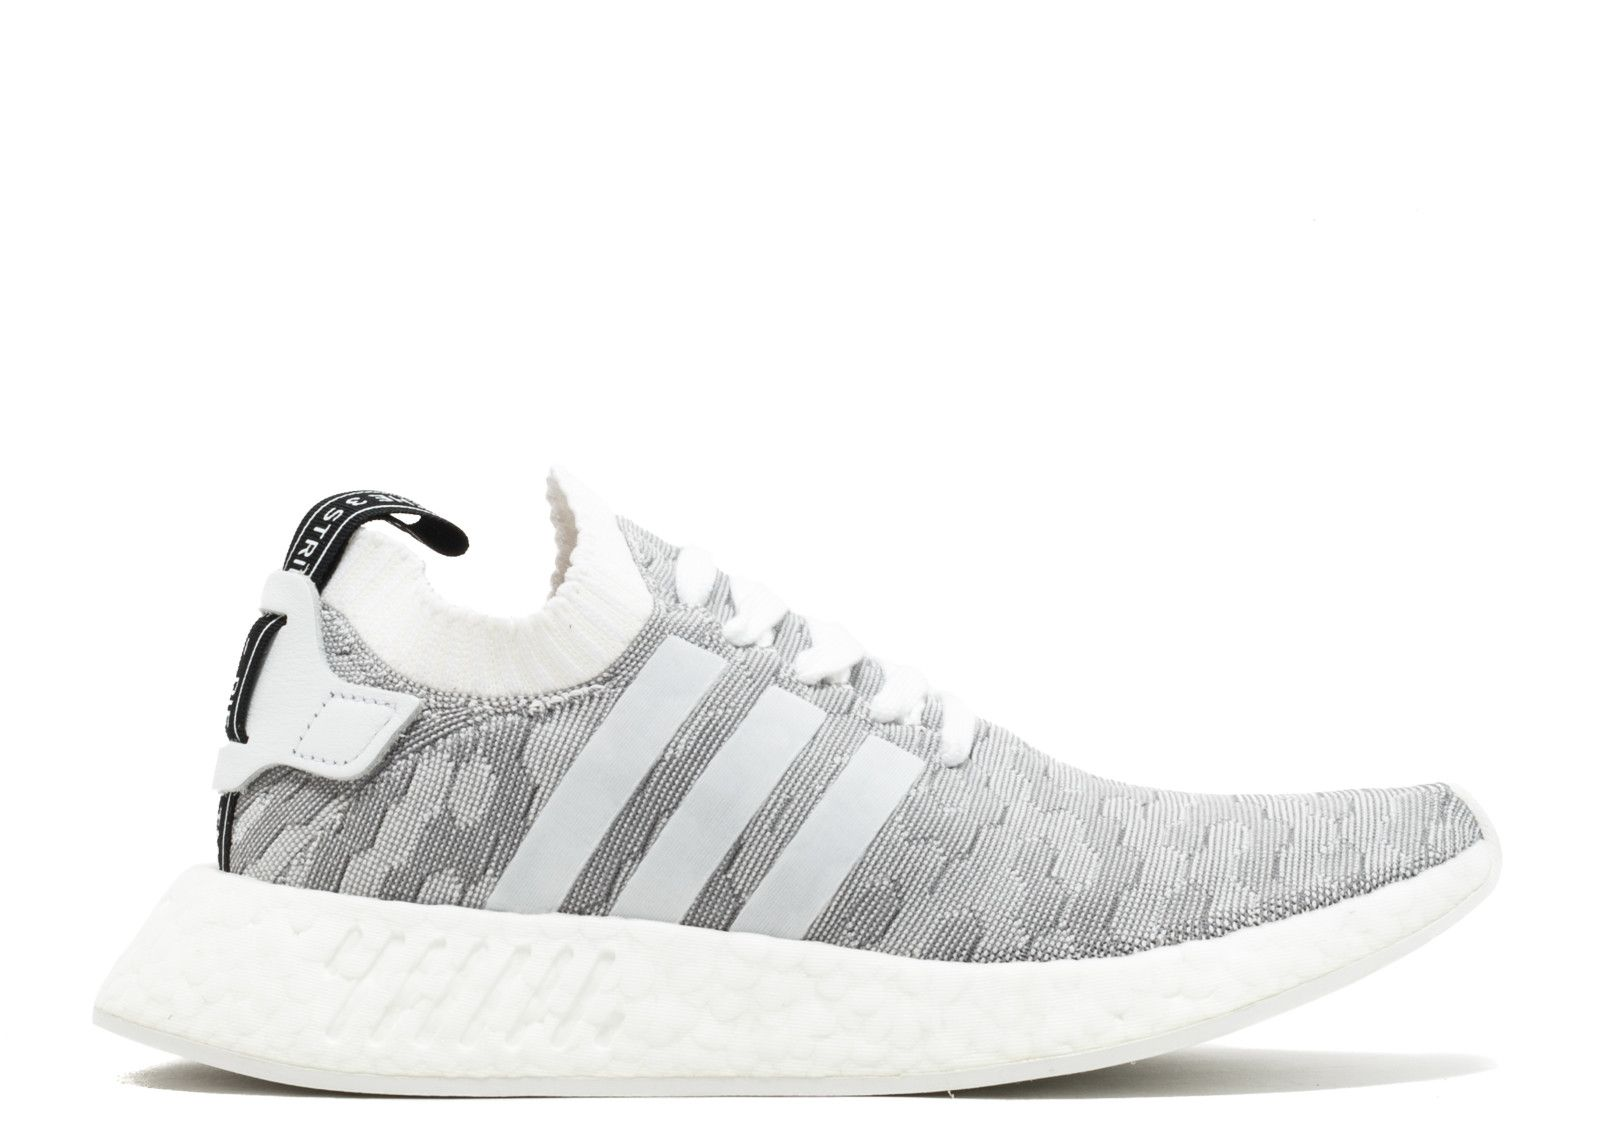 402b840c9 Adidas NMD R2 W Wonpink Wonpnk Cblack By9315 Swift Run Shoe ...